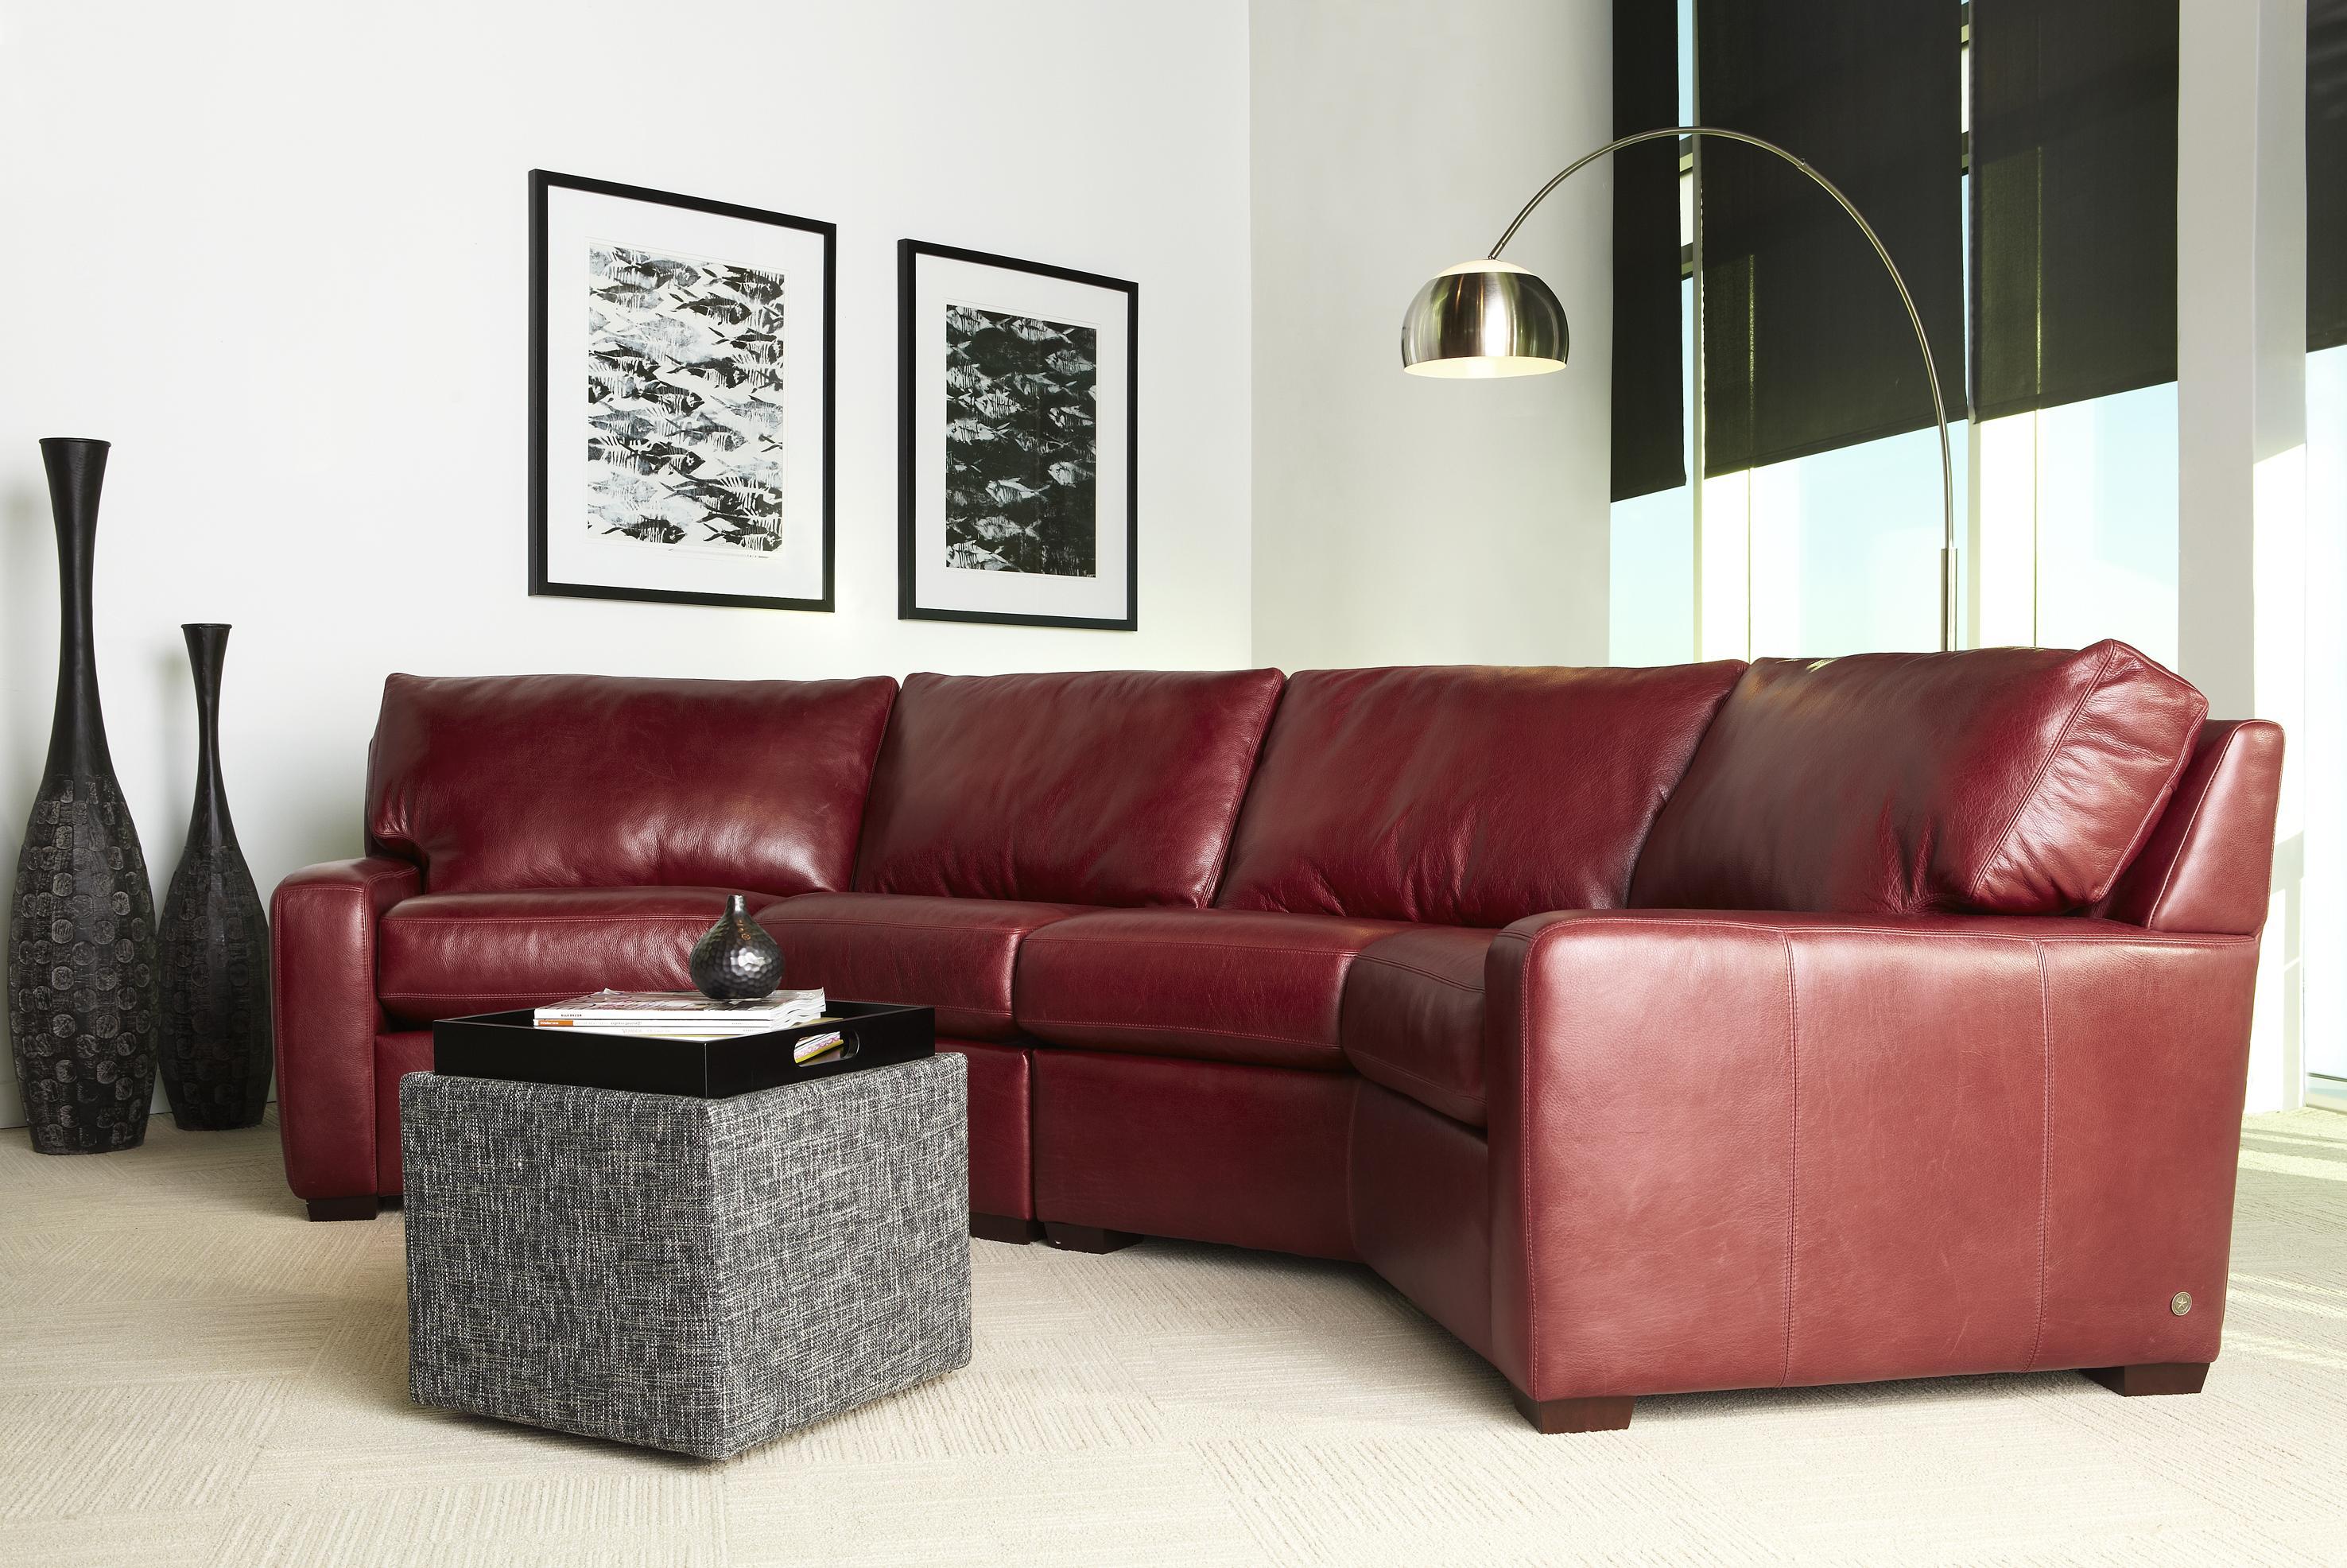 American Leather Carson Leather Sofa Sleeper Boulevard Home